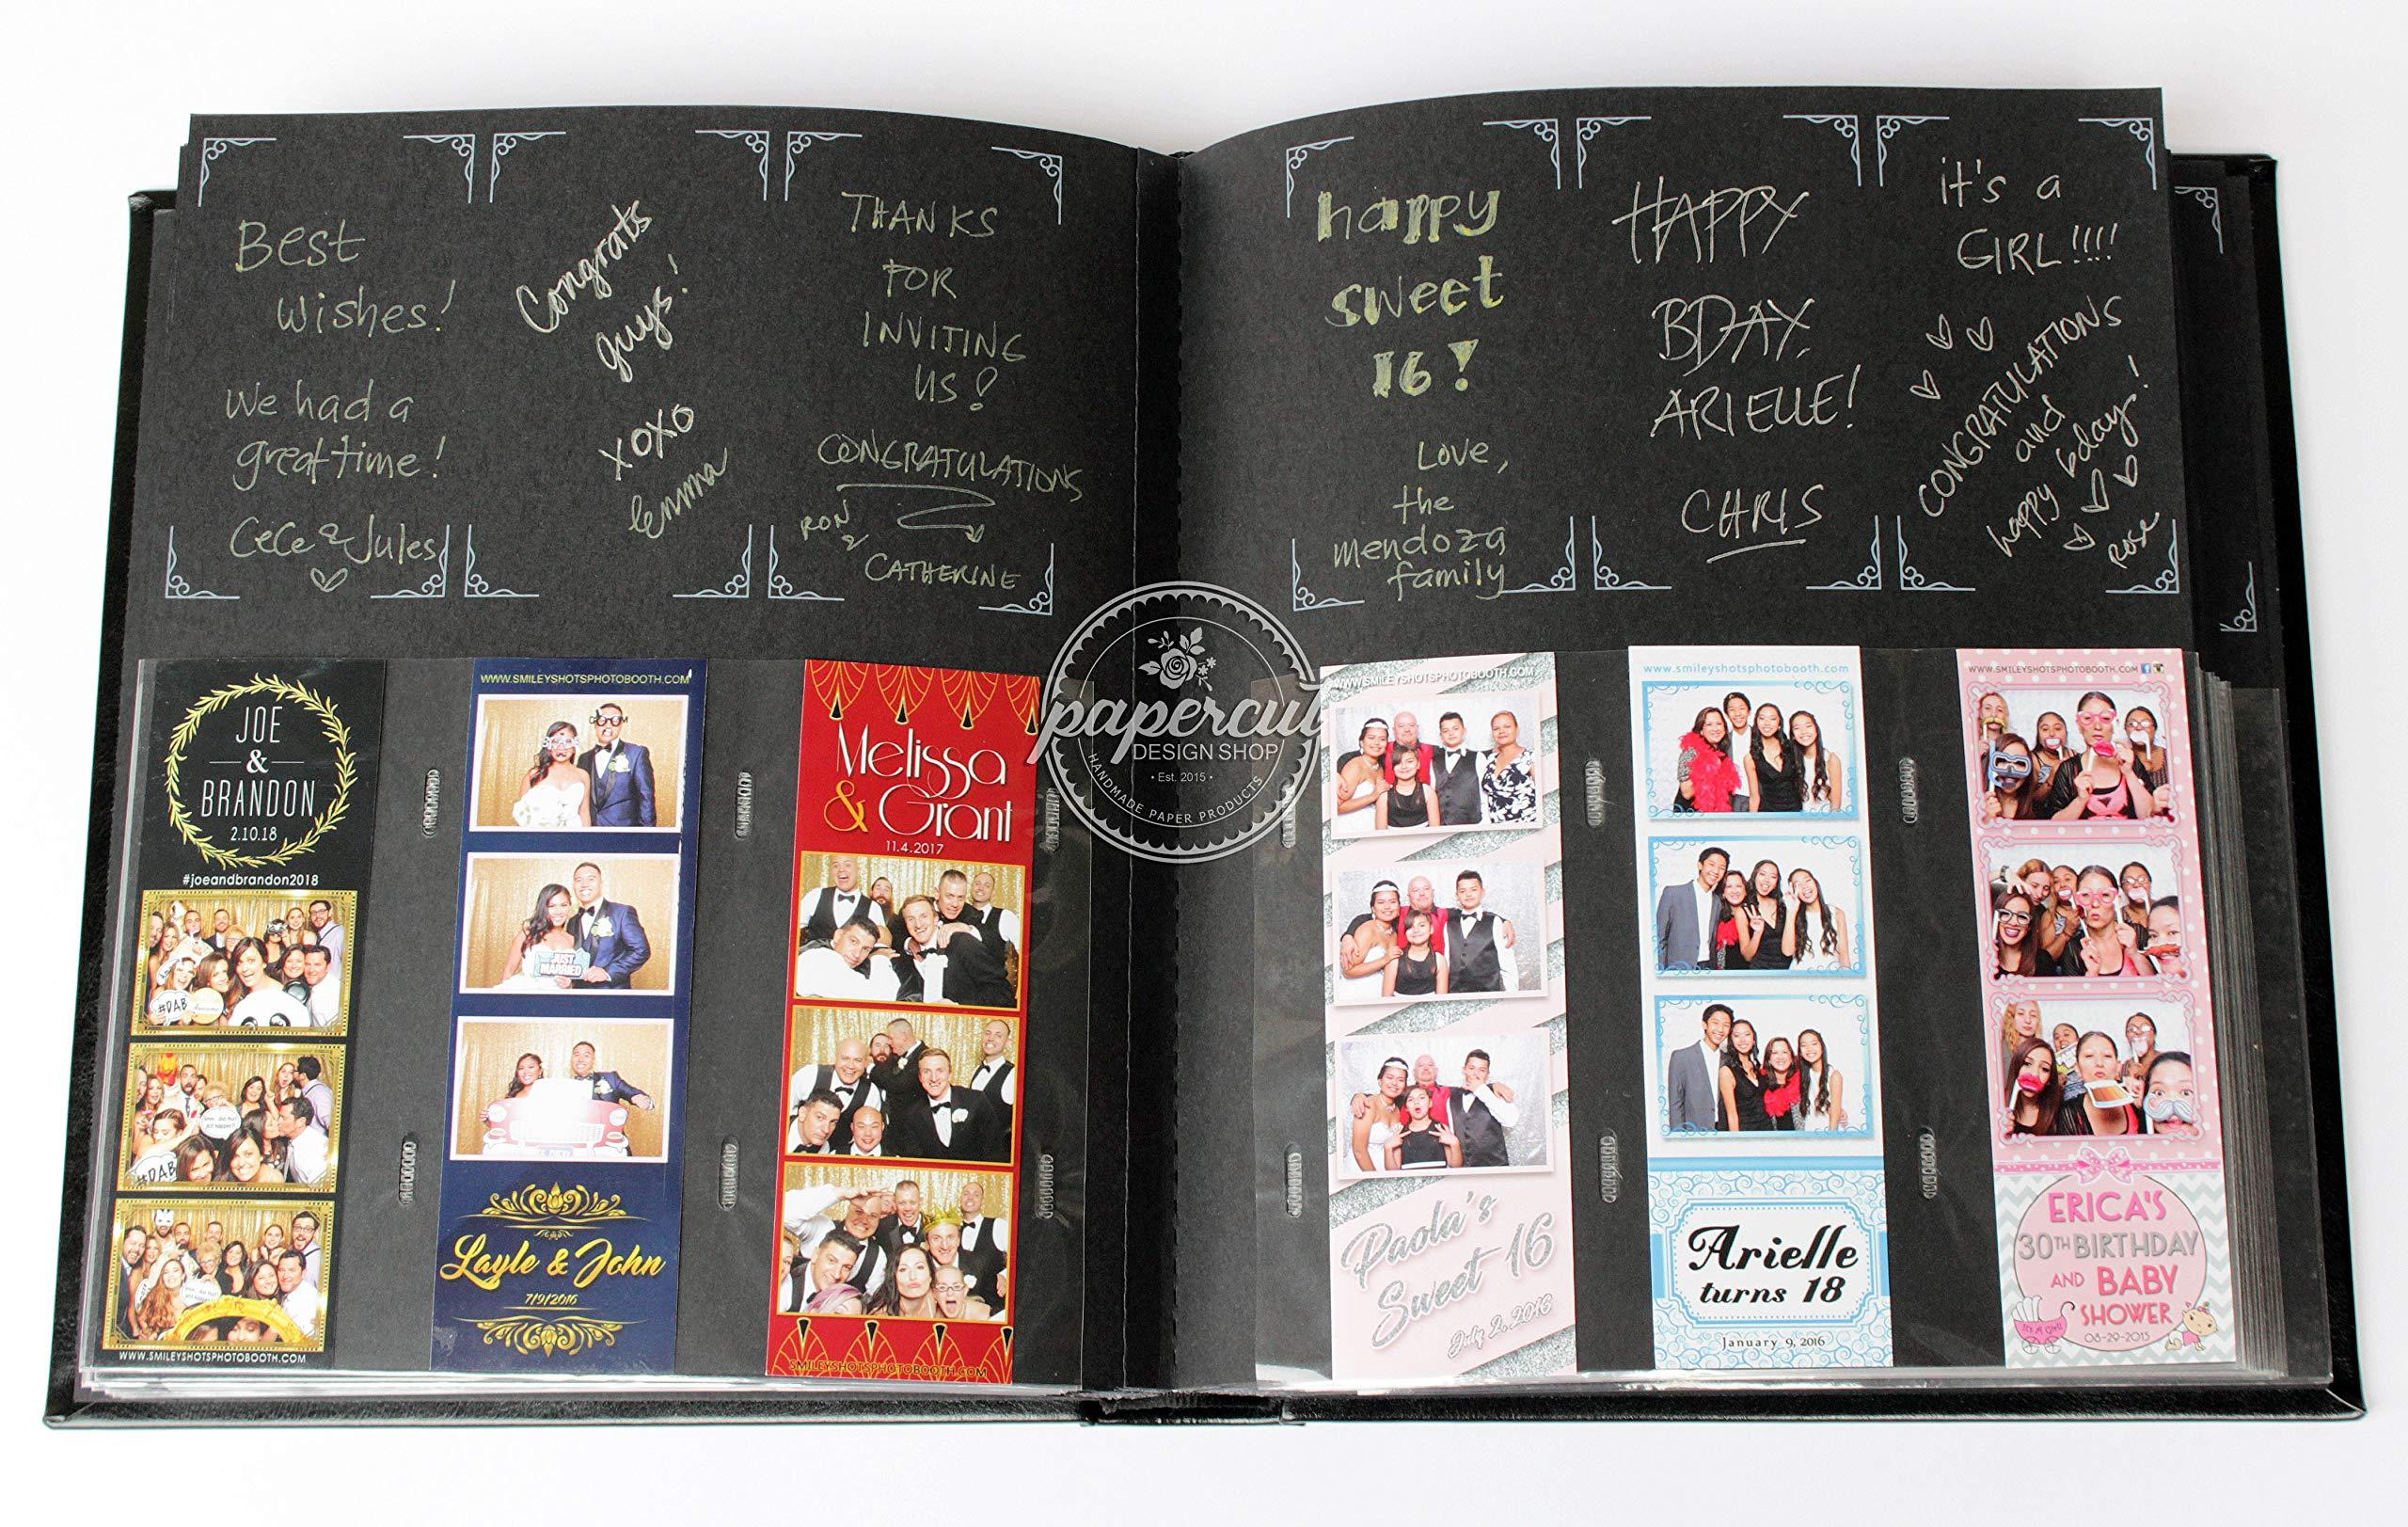 Paper Cut Design Shop Photo Booth Album Box Included Slip-in Plastic Slots Elegant Leatherette Black Album 2x6 Photos by Paper Cut Design Shop